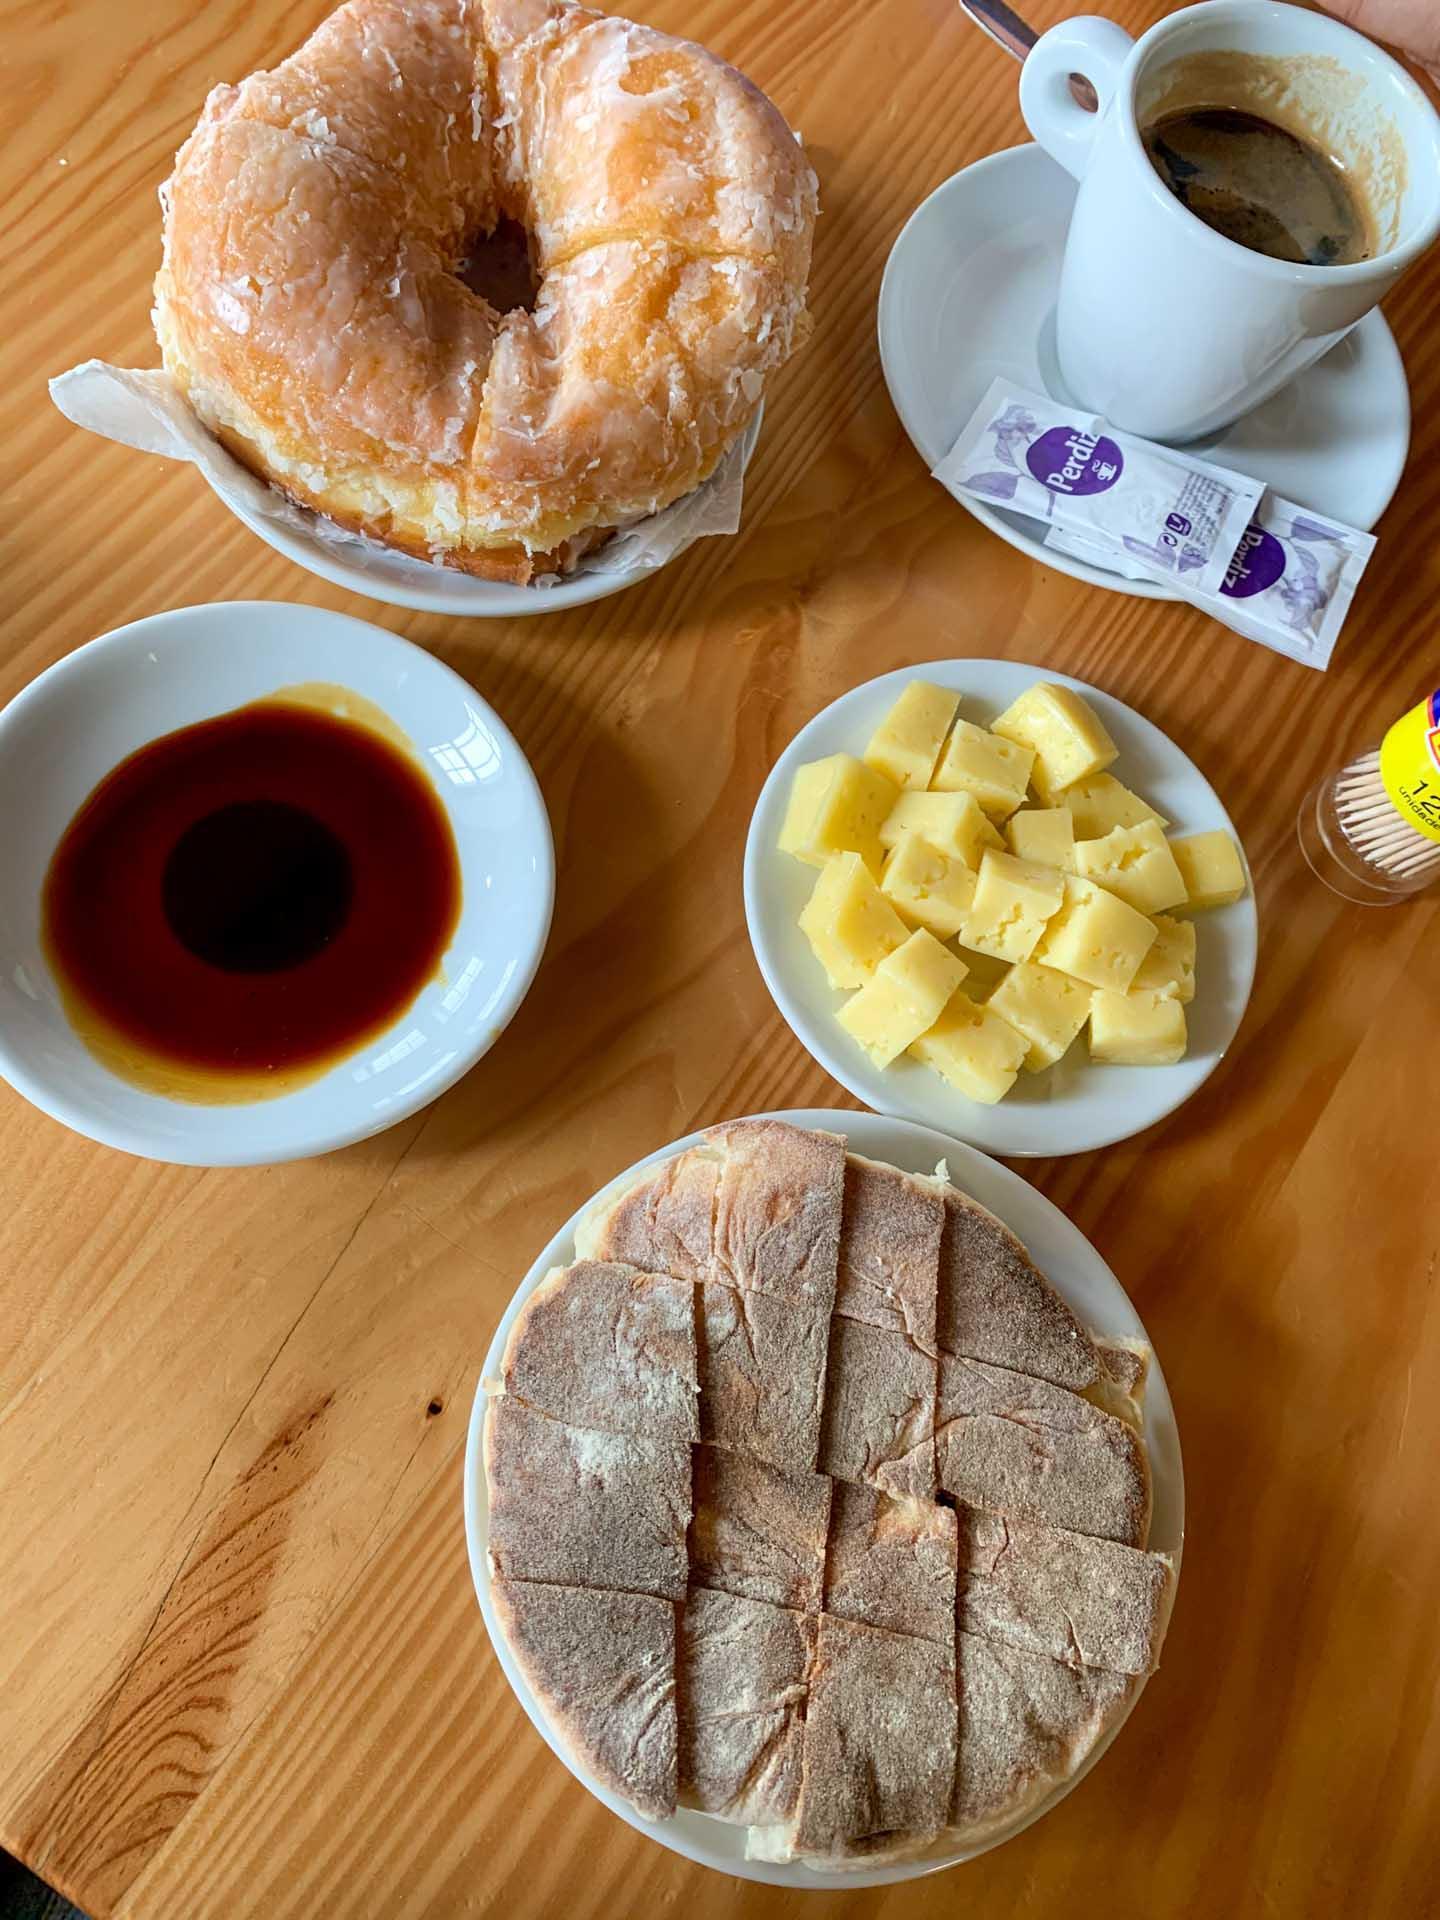 Petit déjeuner typique chez Queijo Vaquinha © YONDER.fr/PG